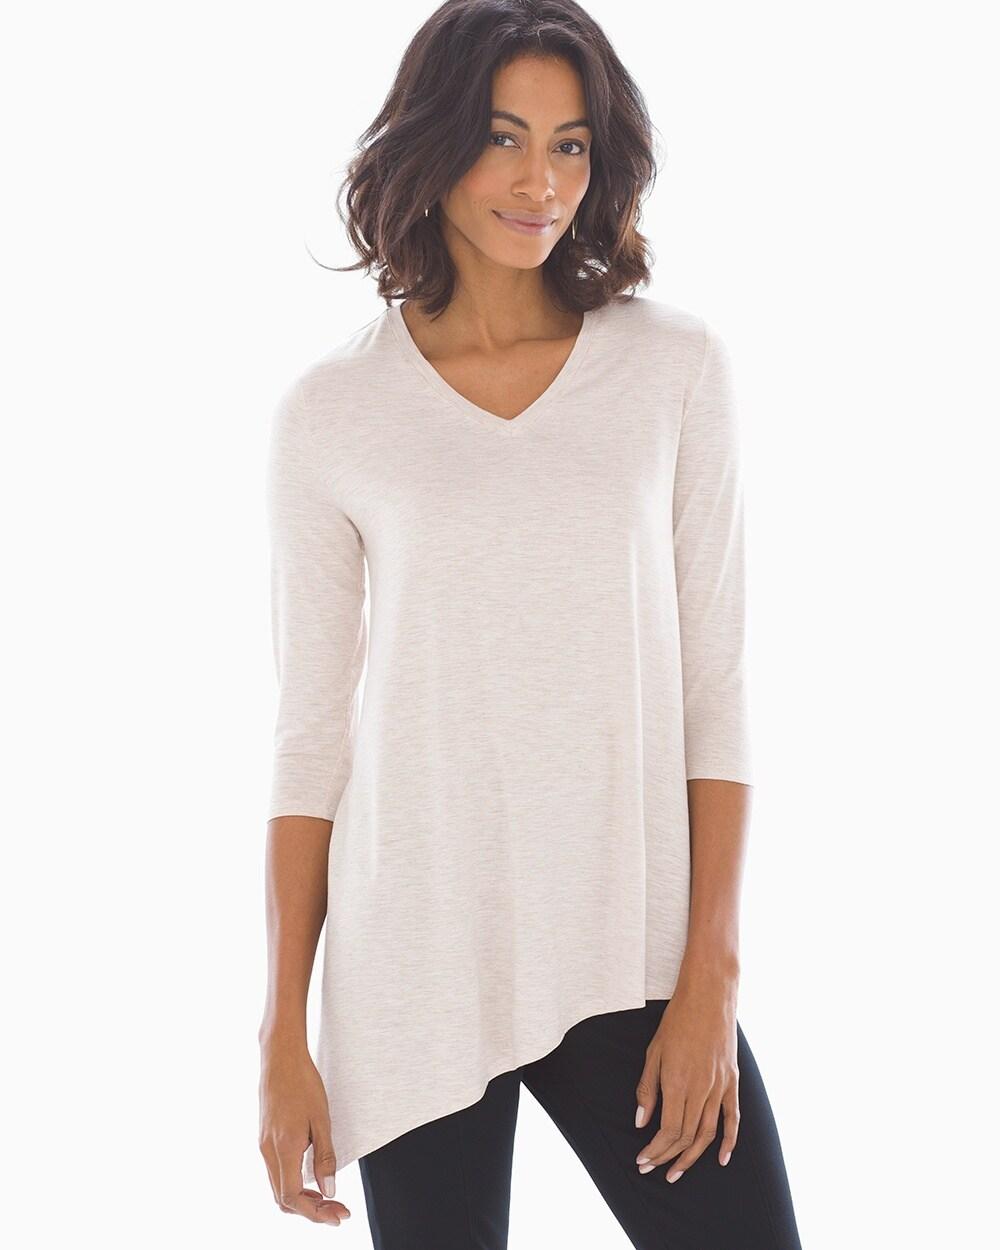 d0d49de9270 Asymmetrical Hem Tunic Tee Heather Blossom - Soma